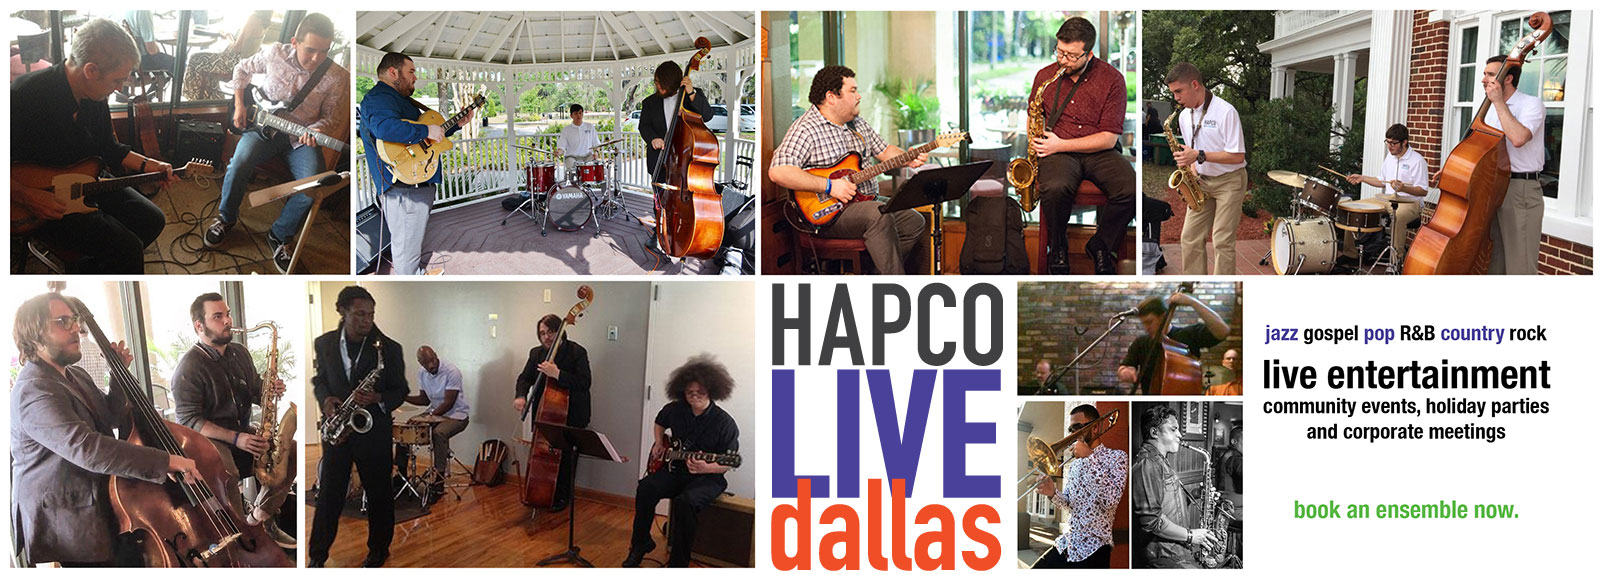 HAPCO LIVE Texas